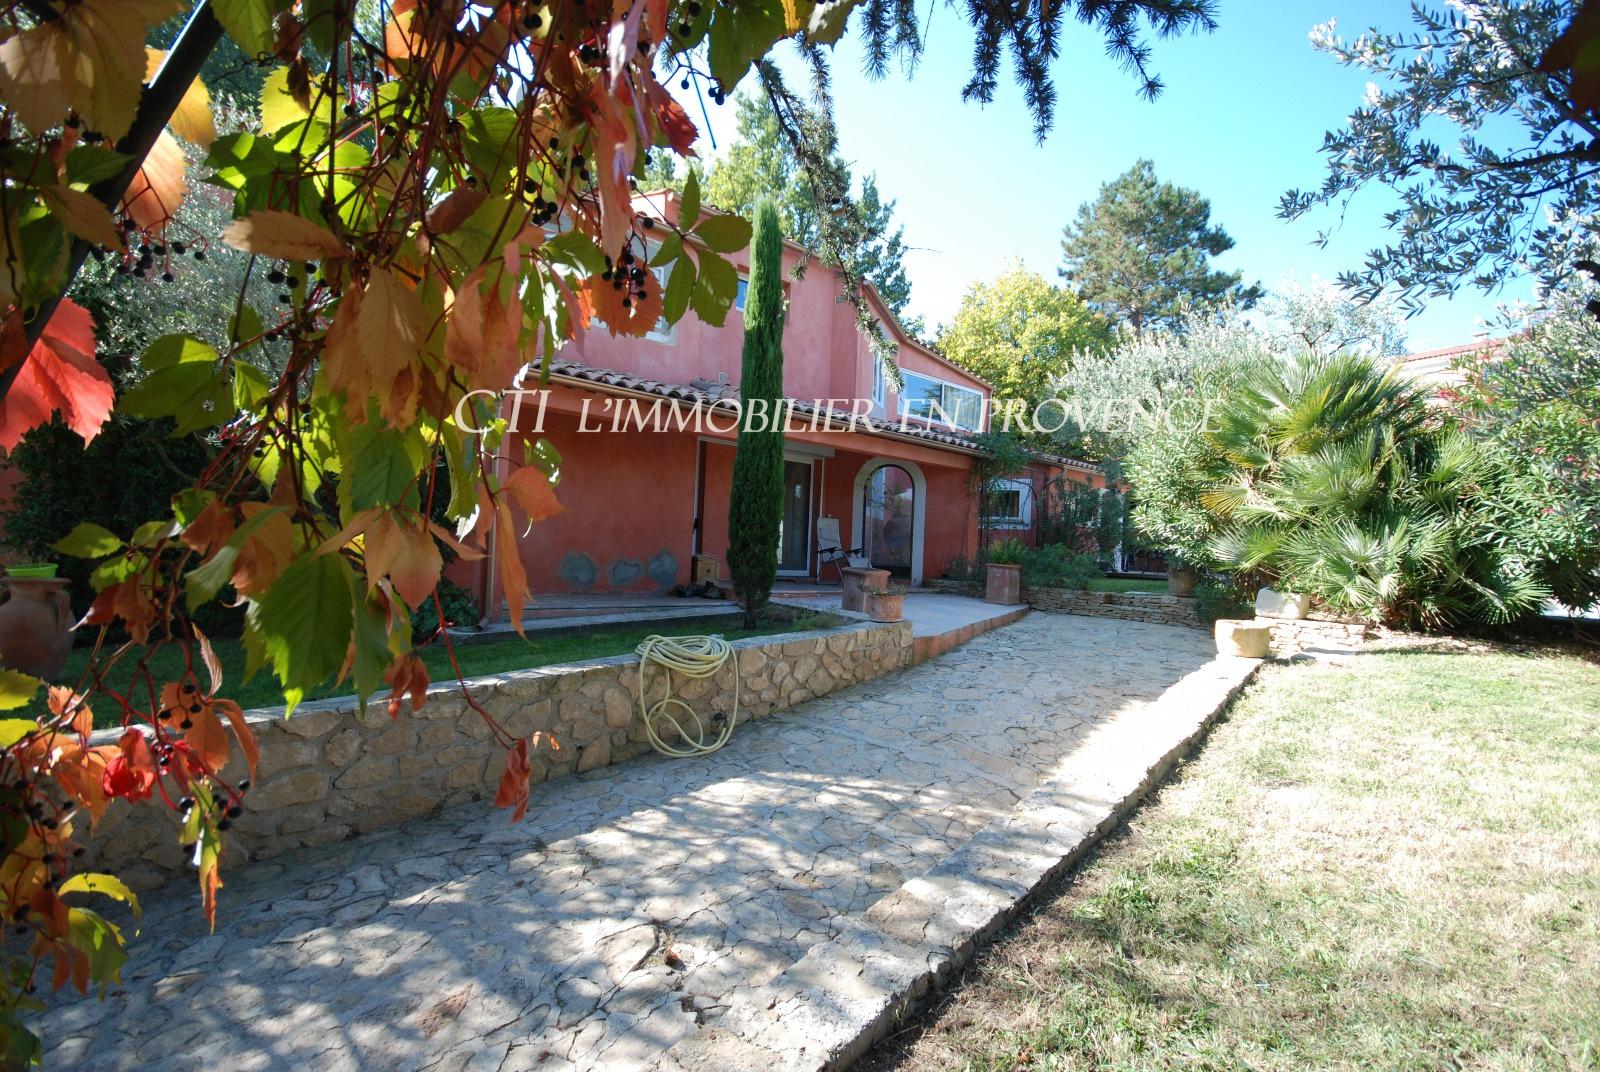 0 www.cti-provence.net VENTE PROPRIETE VILLA CARACTERE CENTRE VILLE VAISON-LA-ROMAINE JARDIN PISCINE